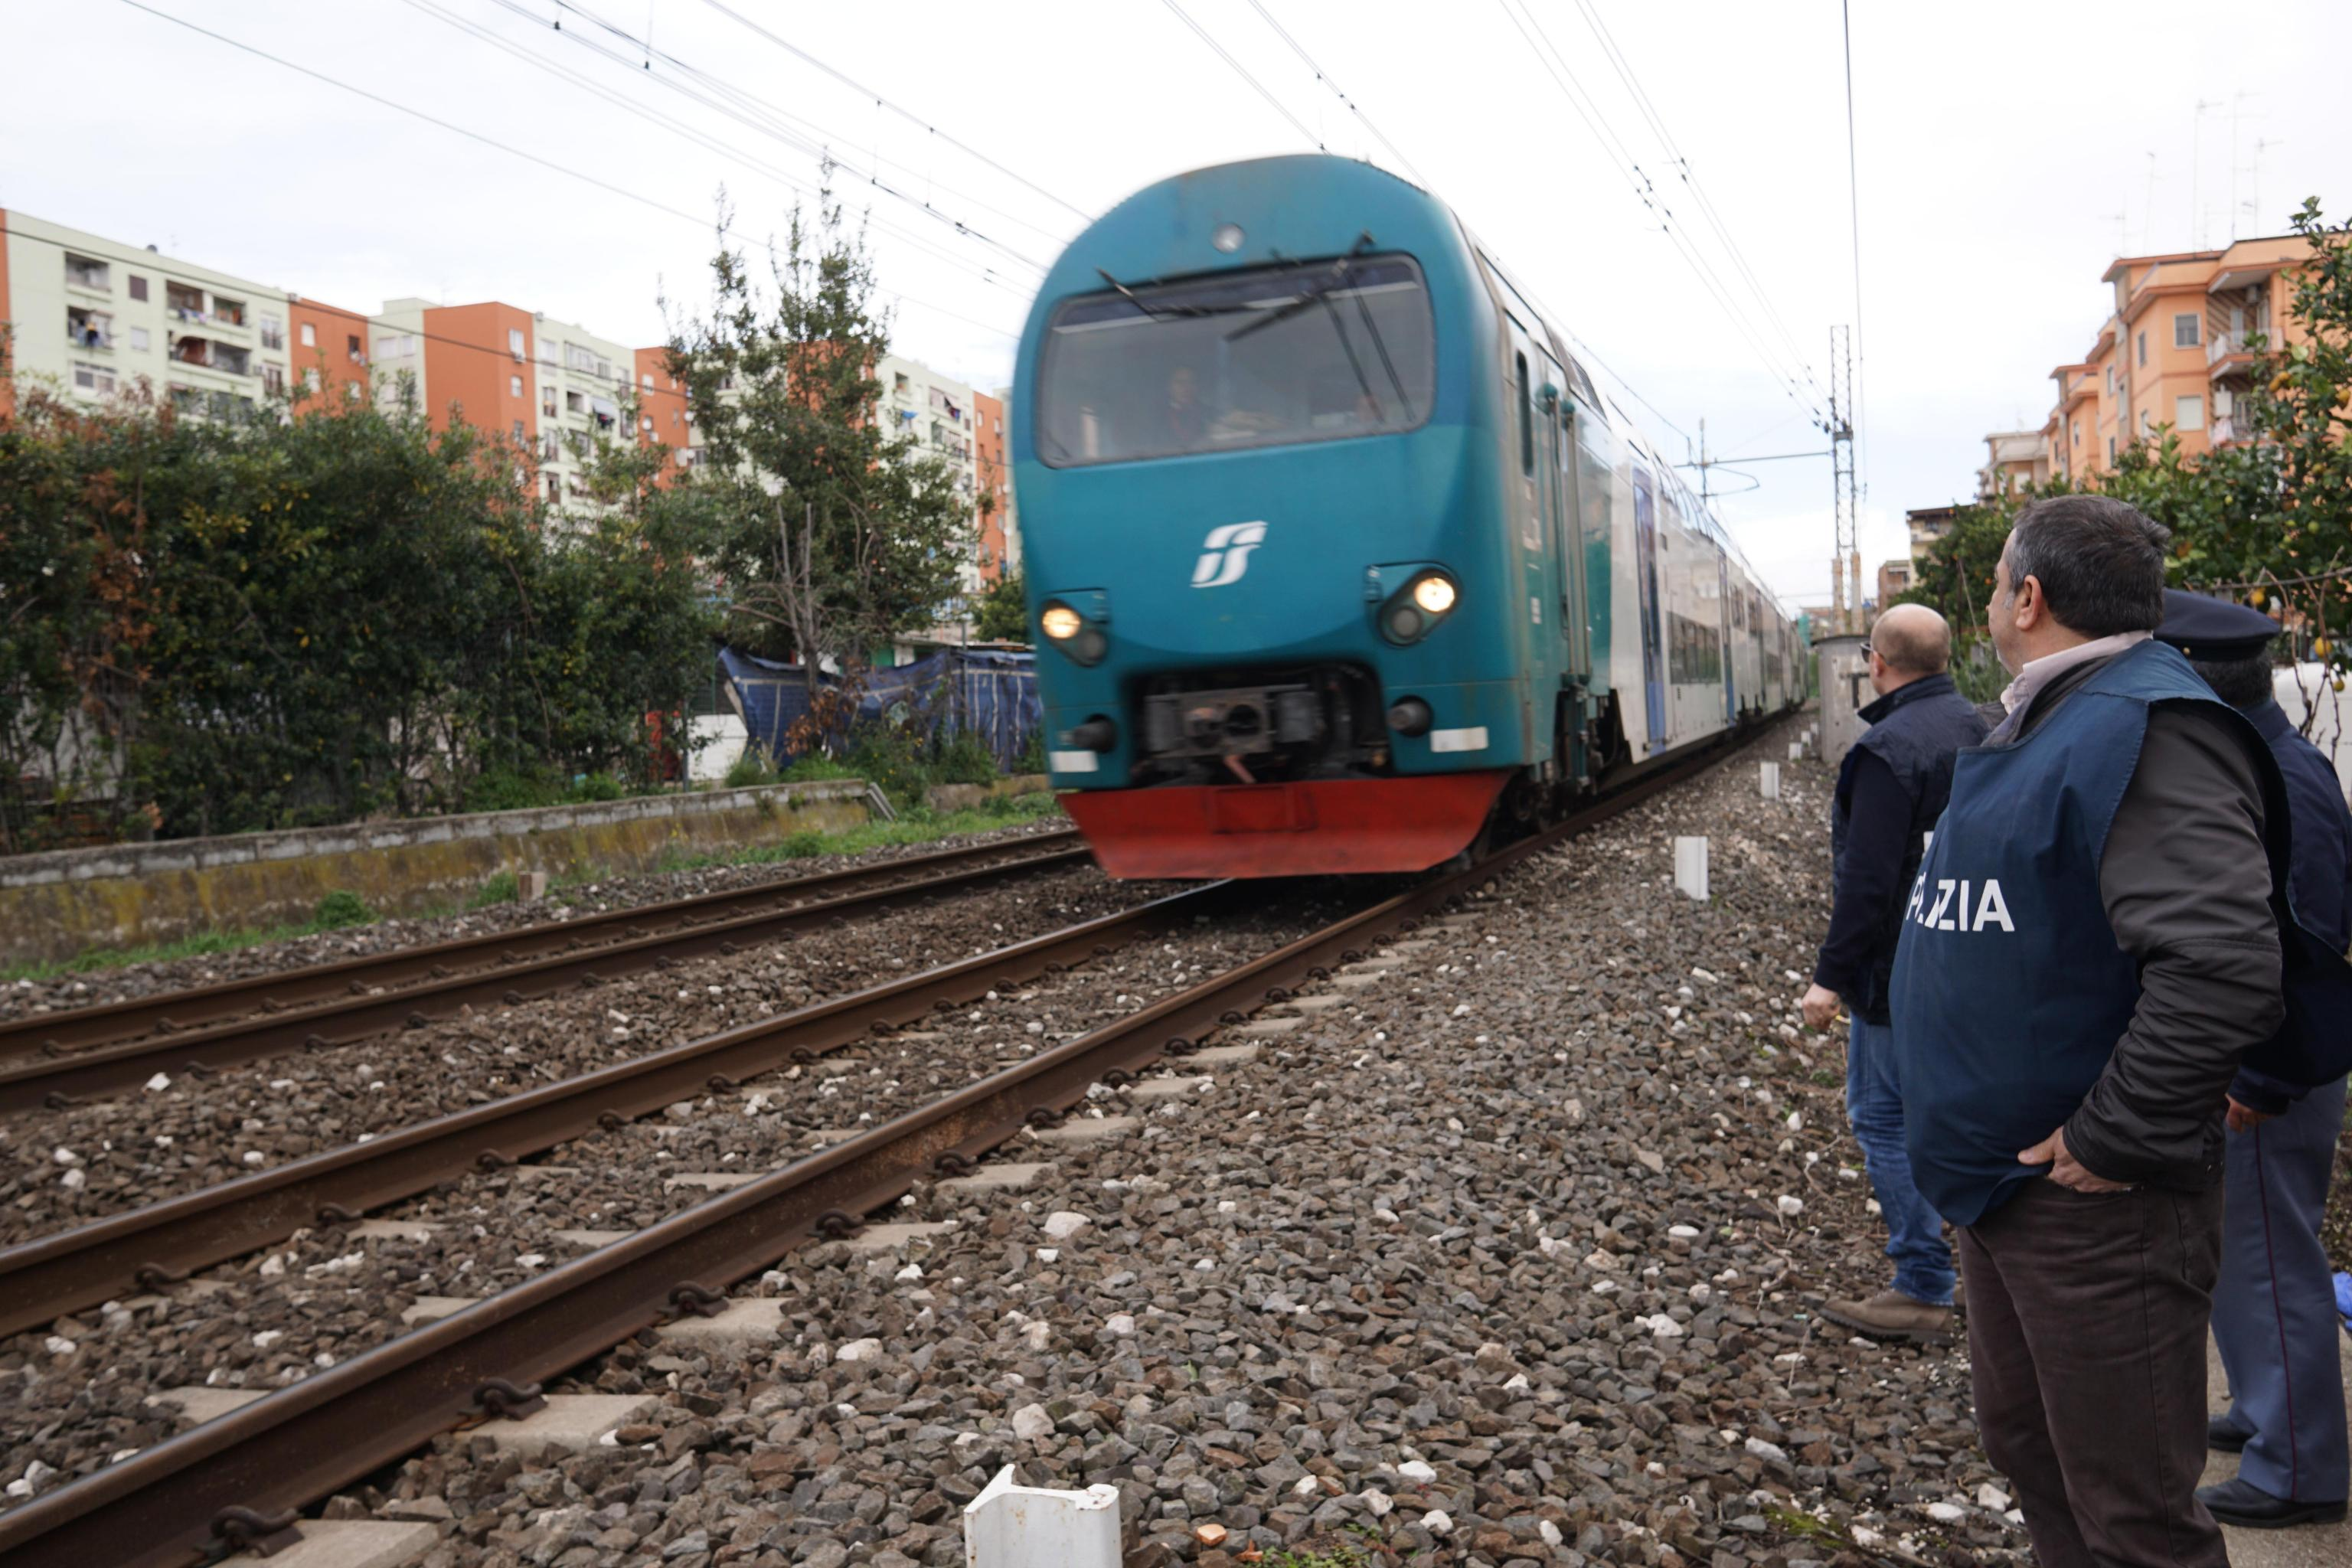 Tragedia in stazione, 15enne investita da un treno a Recale